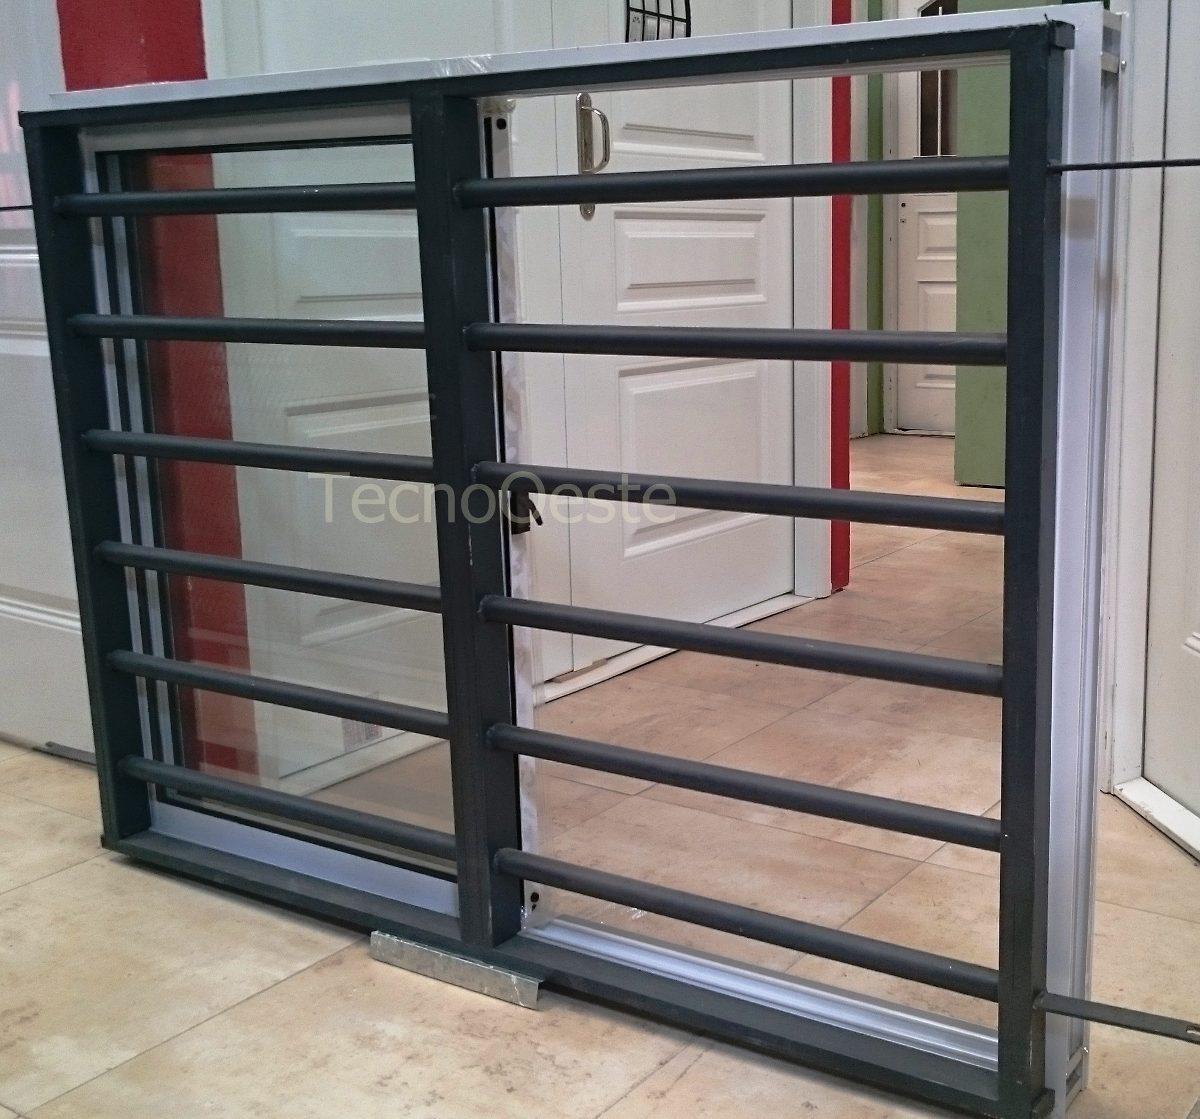 Ventana Aluminio Blanco 150x110 + Reja Tubos Horizontales - $ 4.800 ...